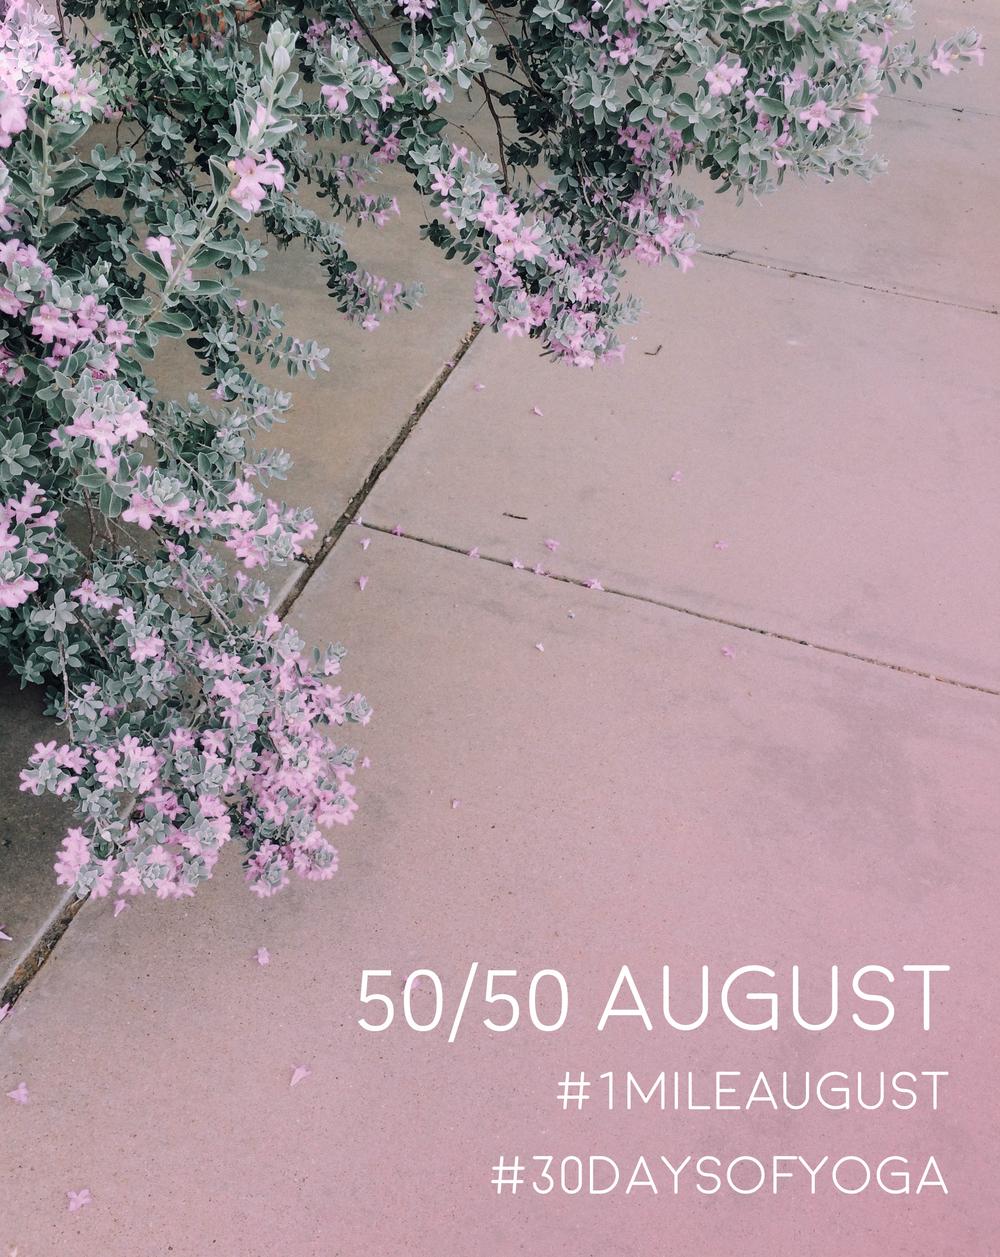 50/50 August #1mileaugust #30daysofyoga | ashleyjoanna.com